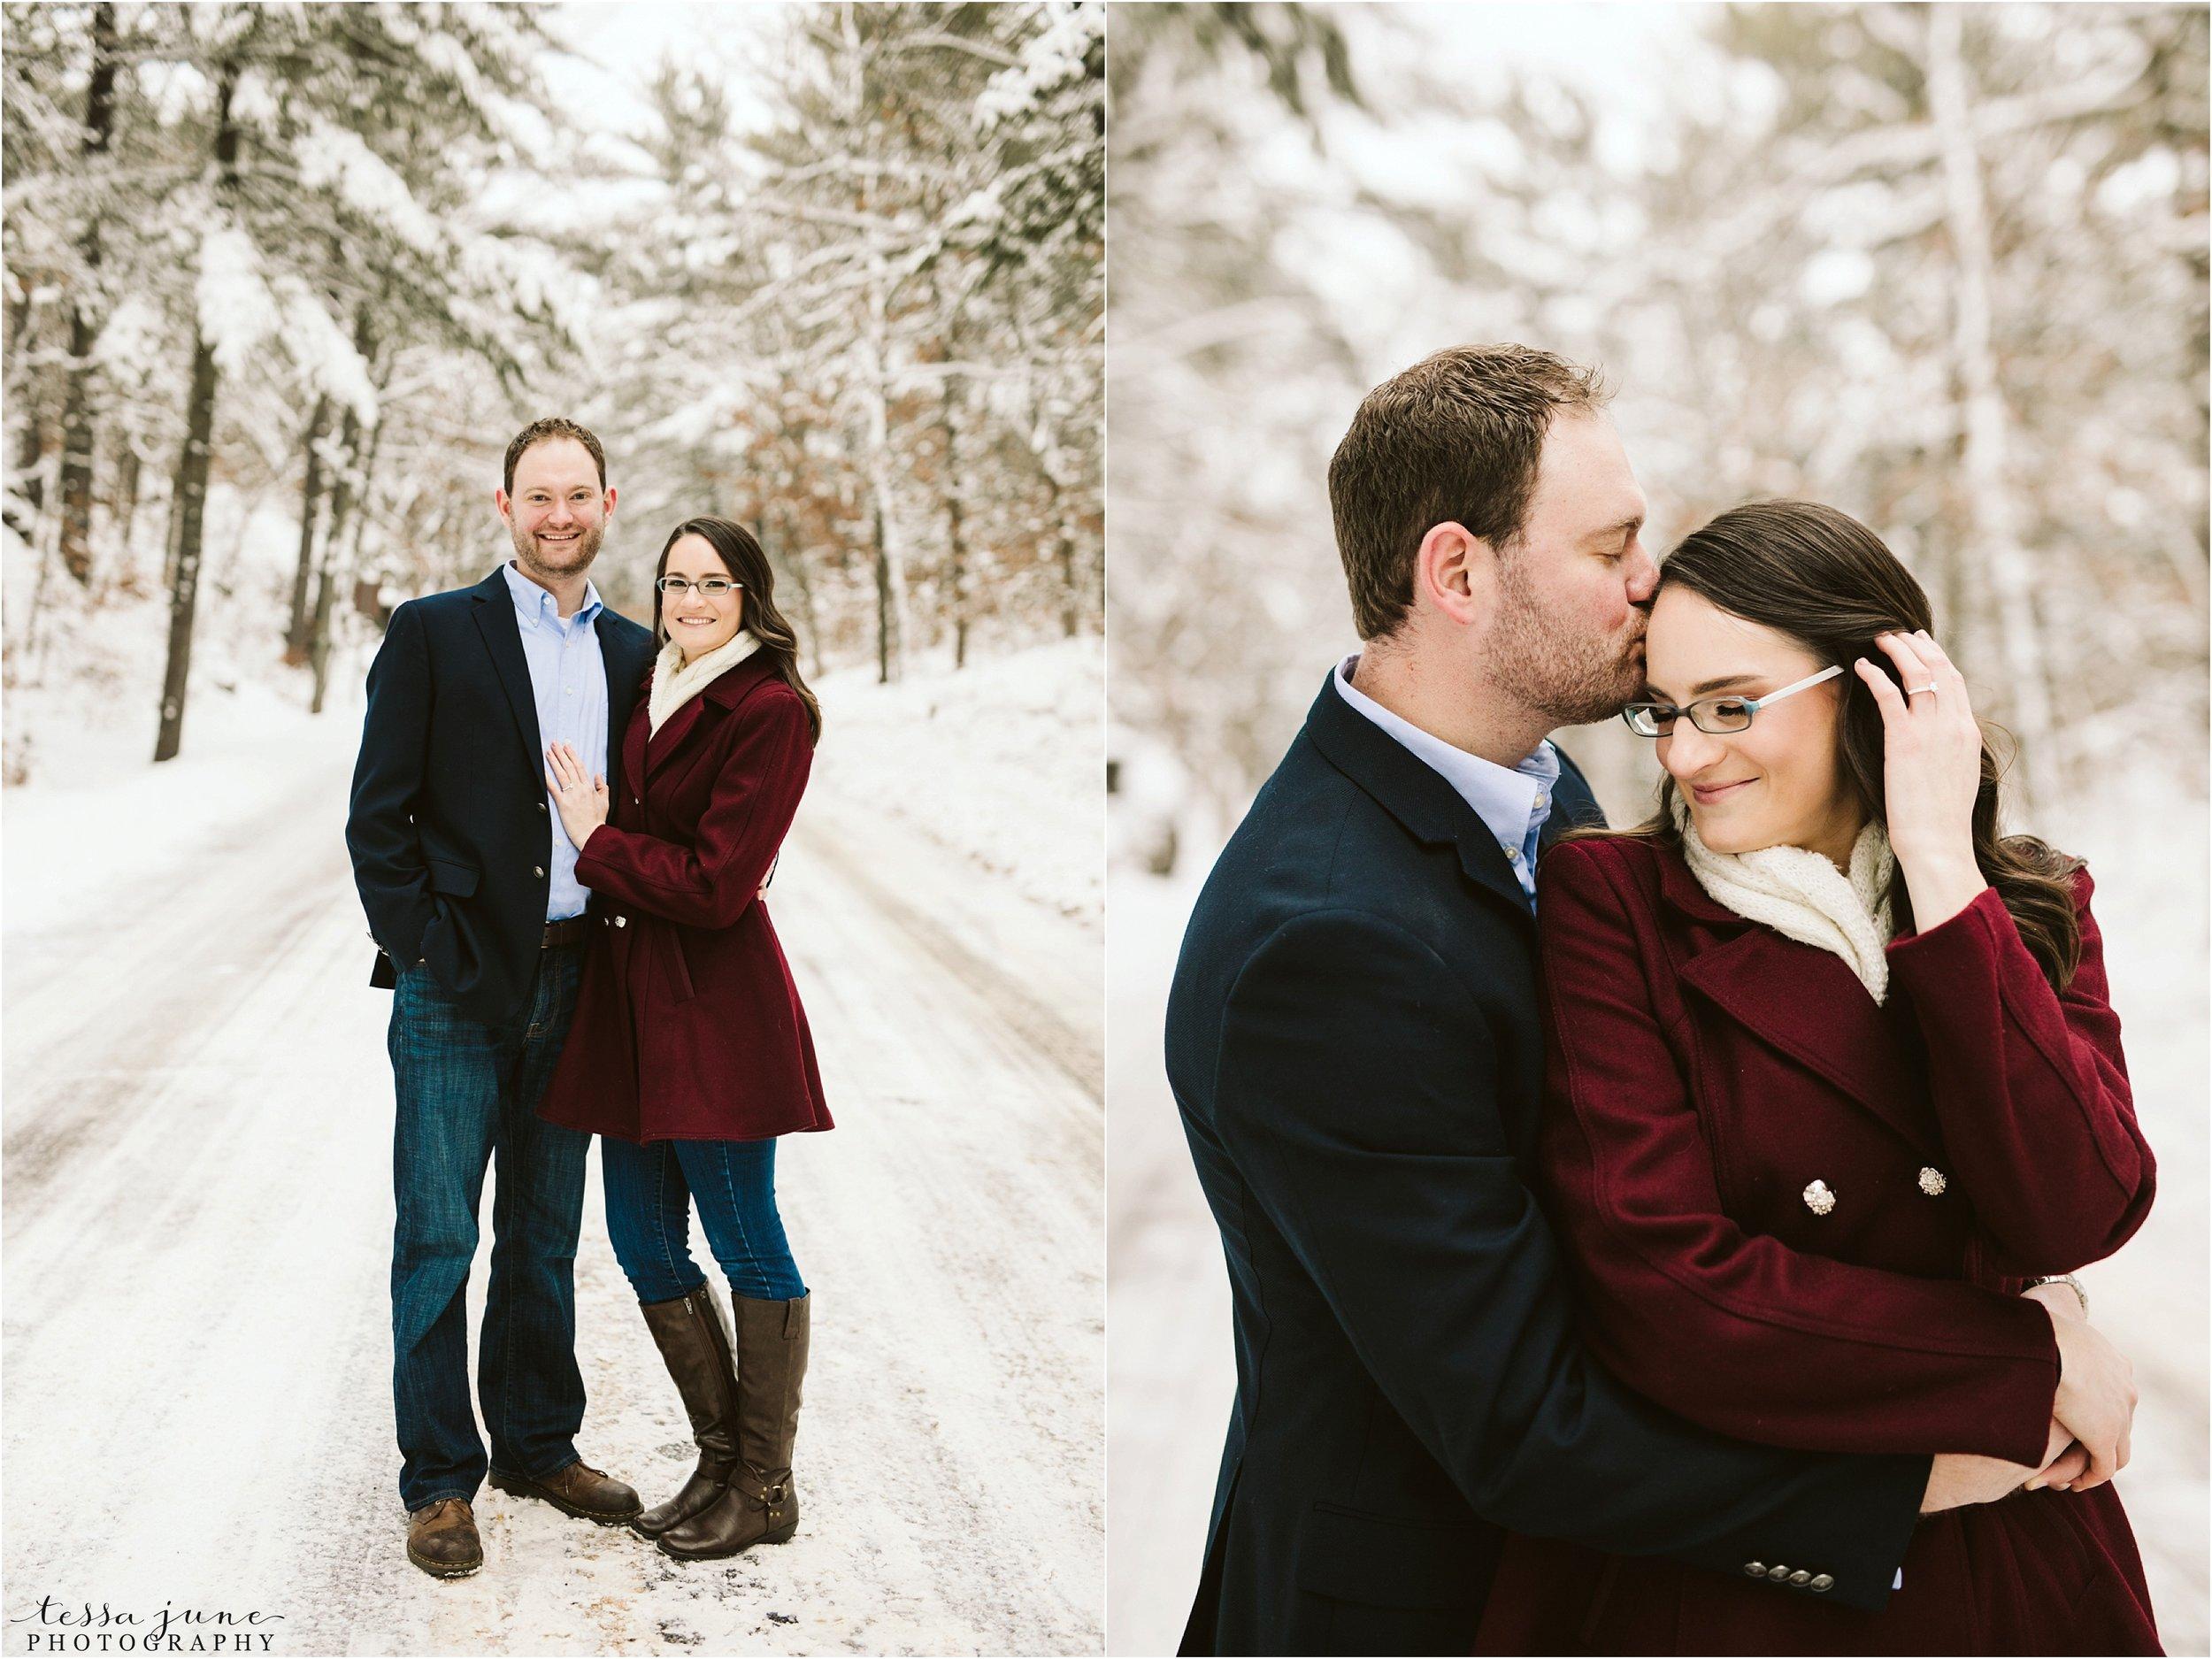 taylors-falls-winter-engagement-session-st-cloud-photographer-1.jpg